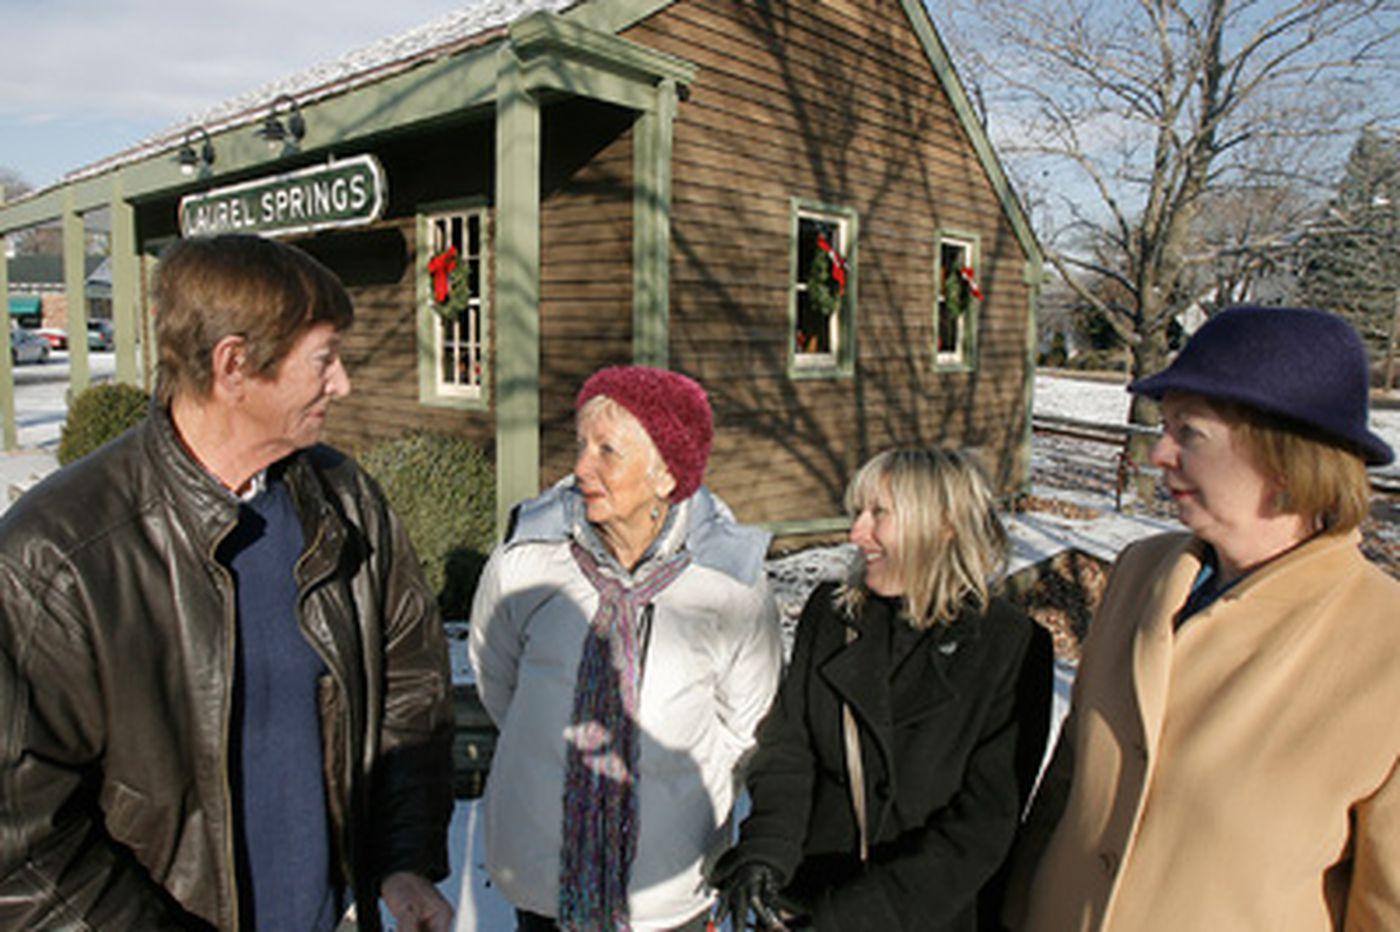 Kevin Riordan: Laurel Springs facing a tough choice